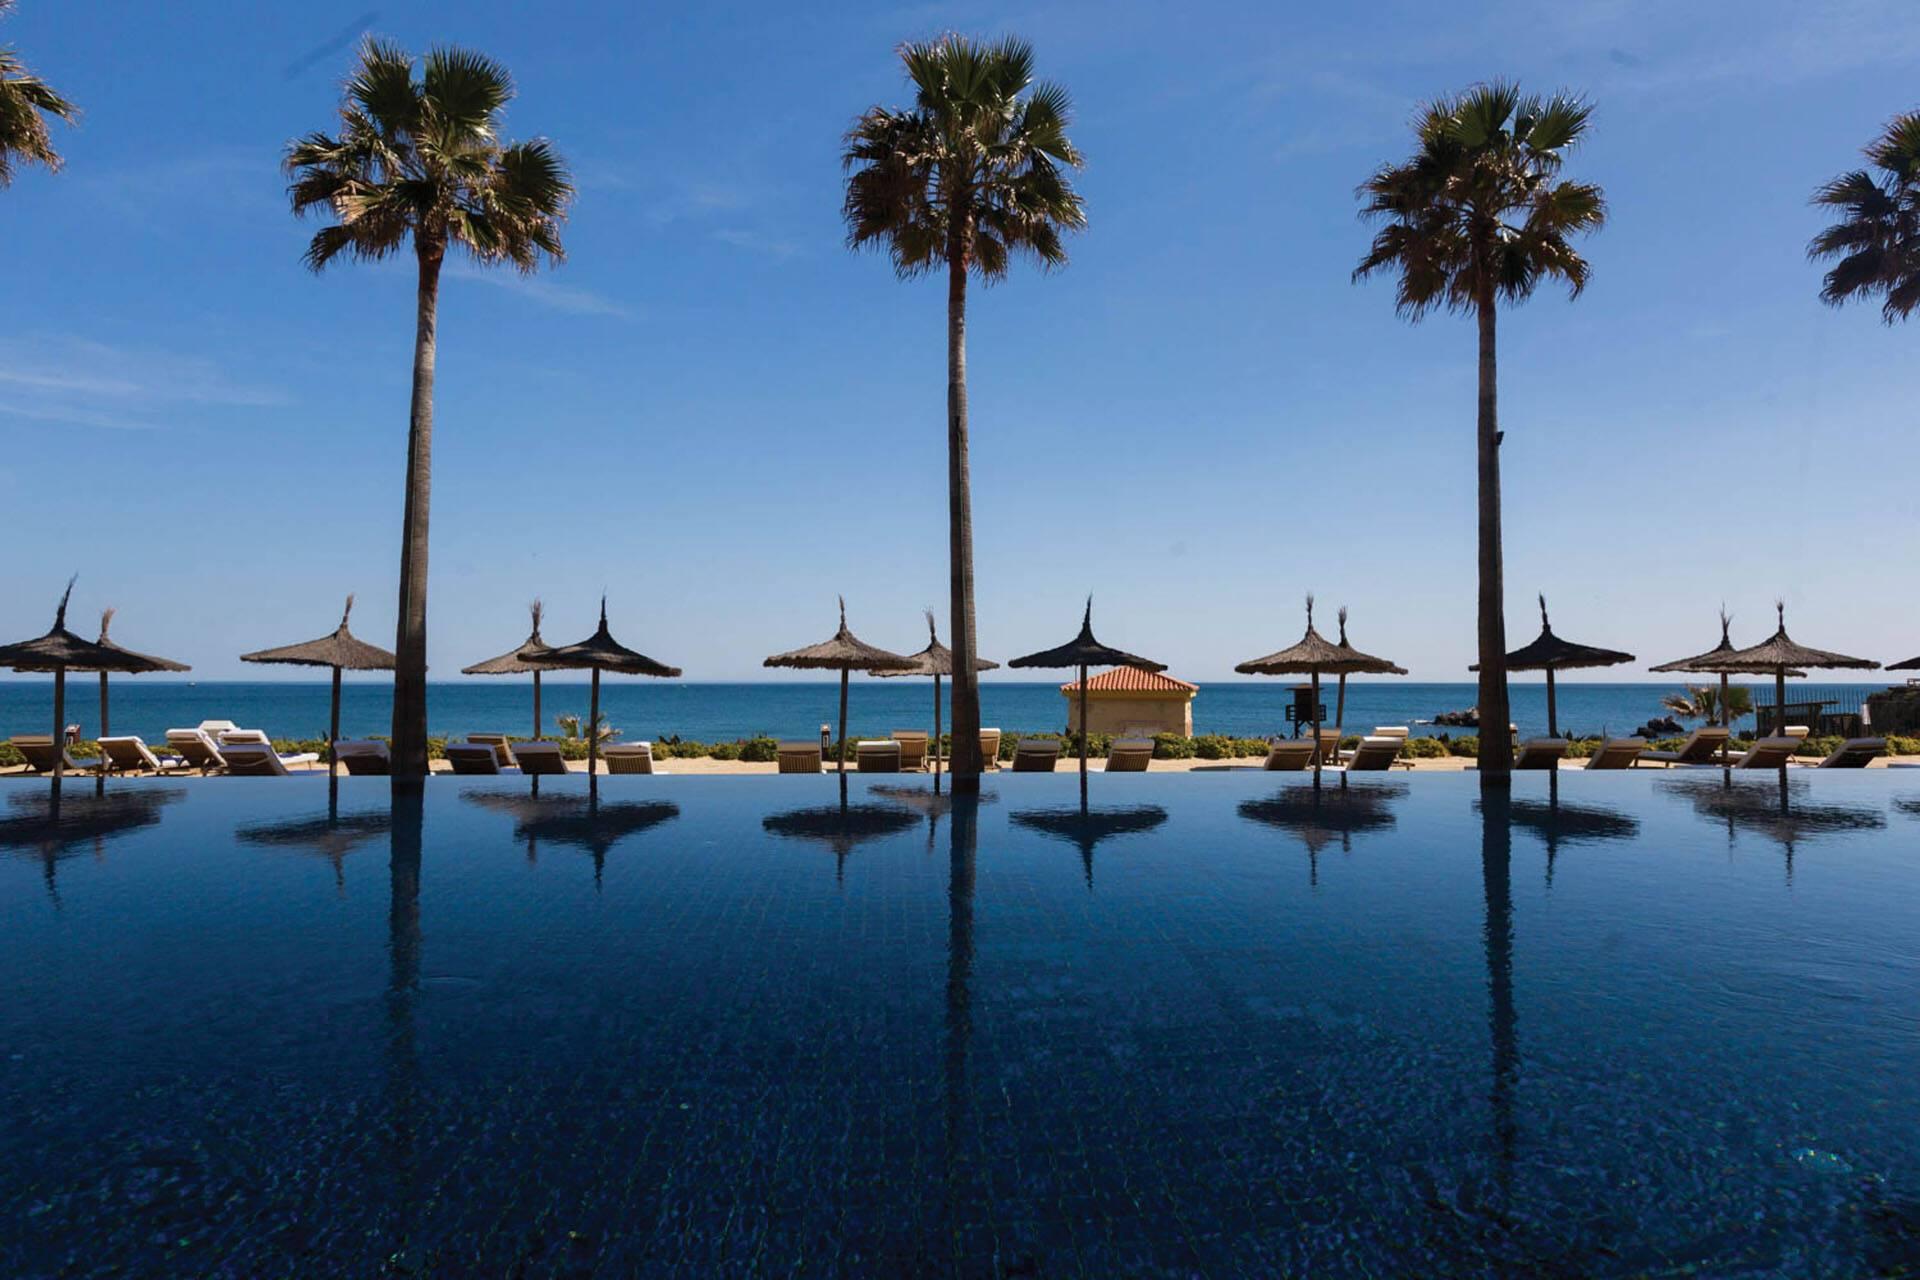 Finca Cortesin Marbella Beach Club